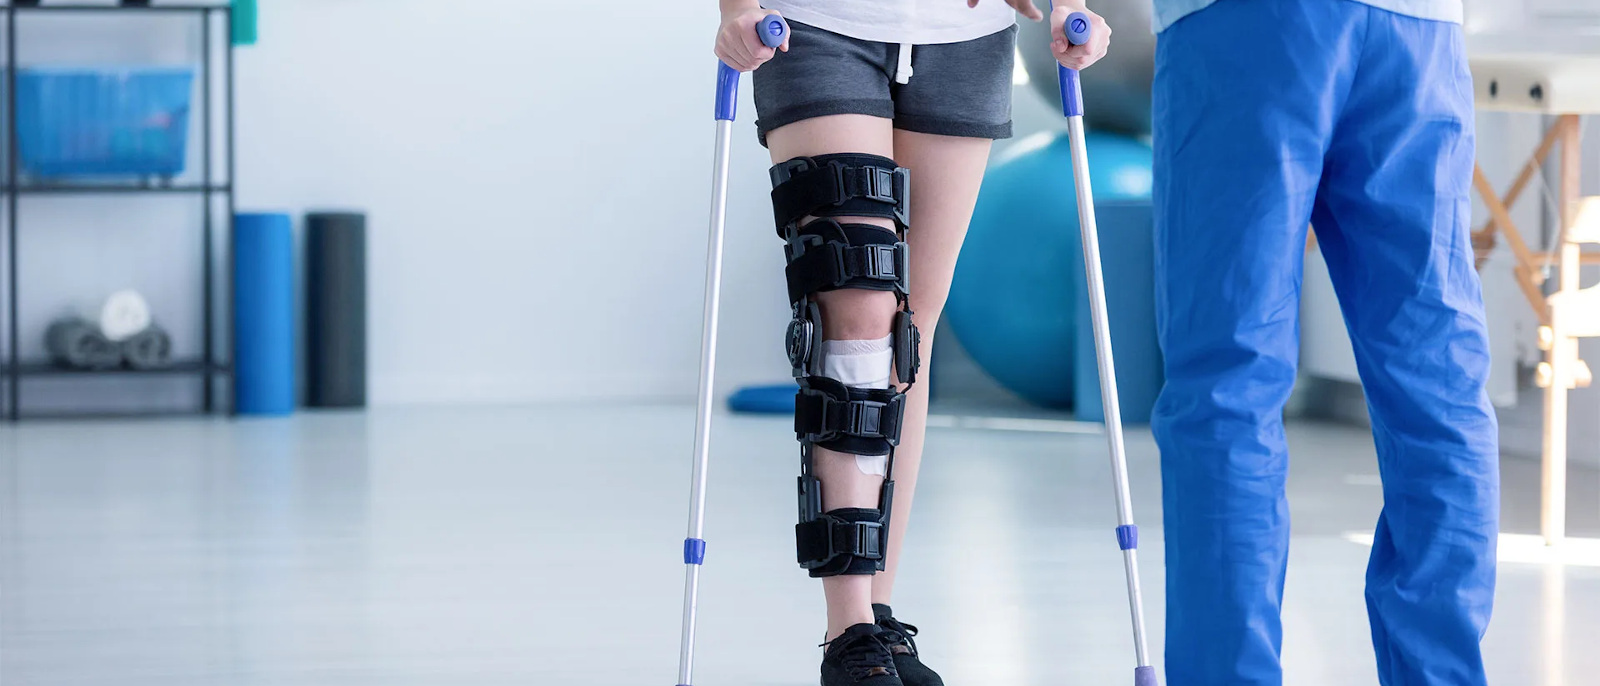 tivoli-ortopedia-scarpe